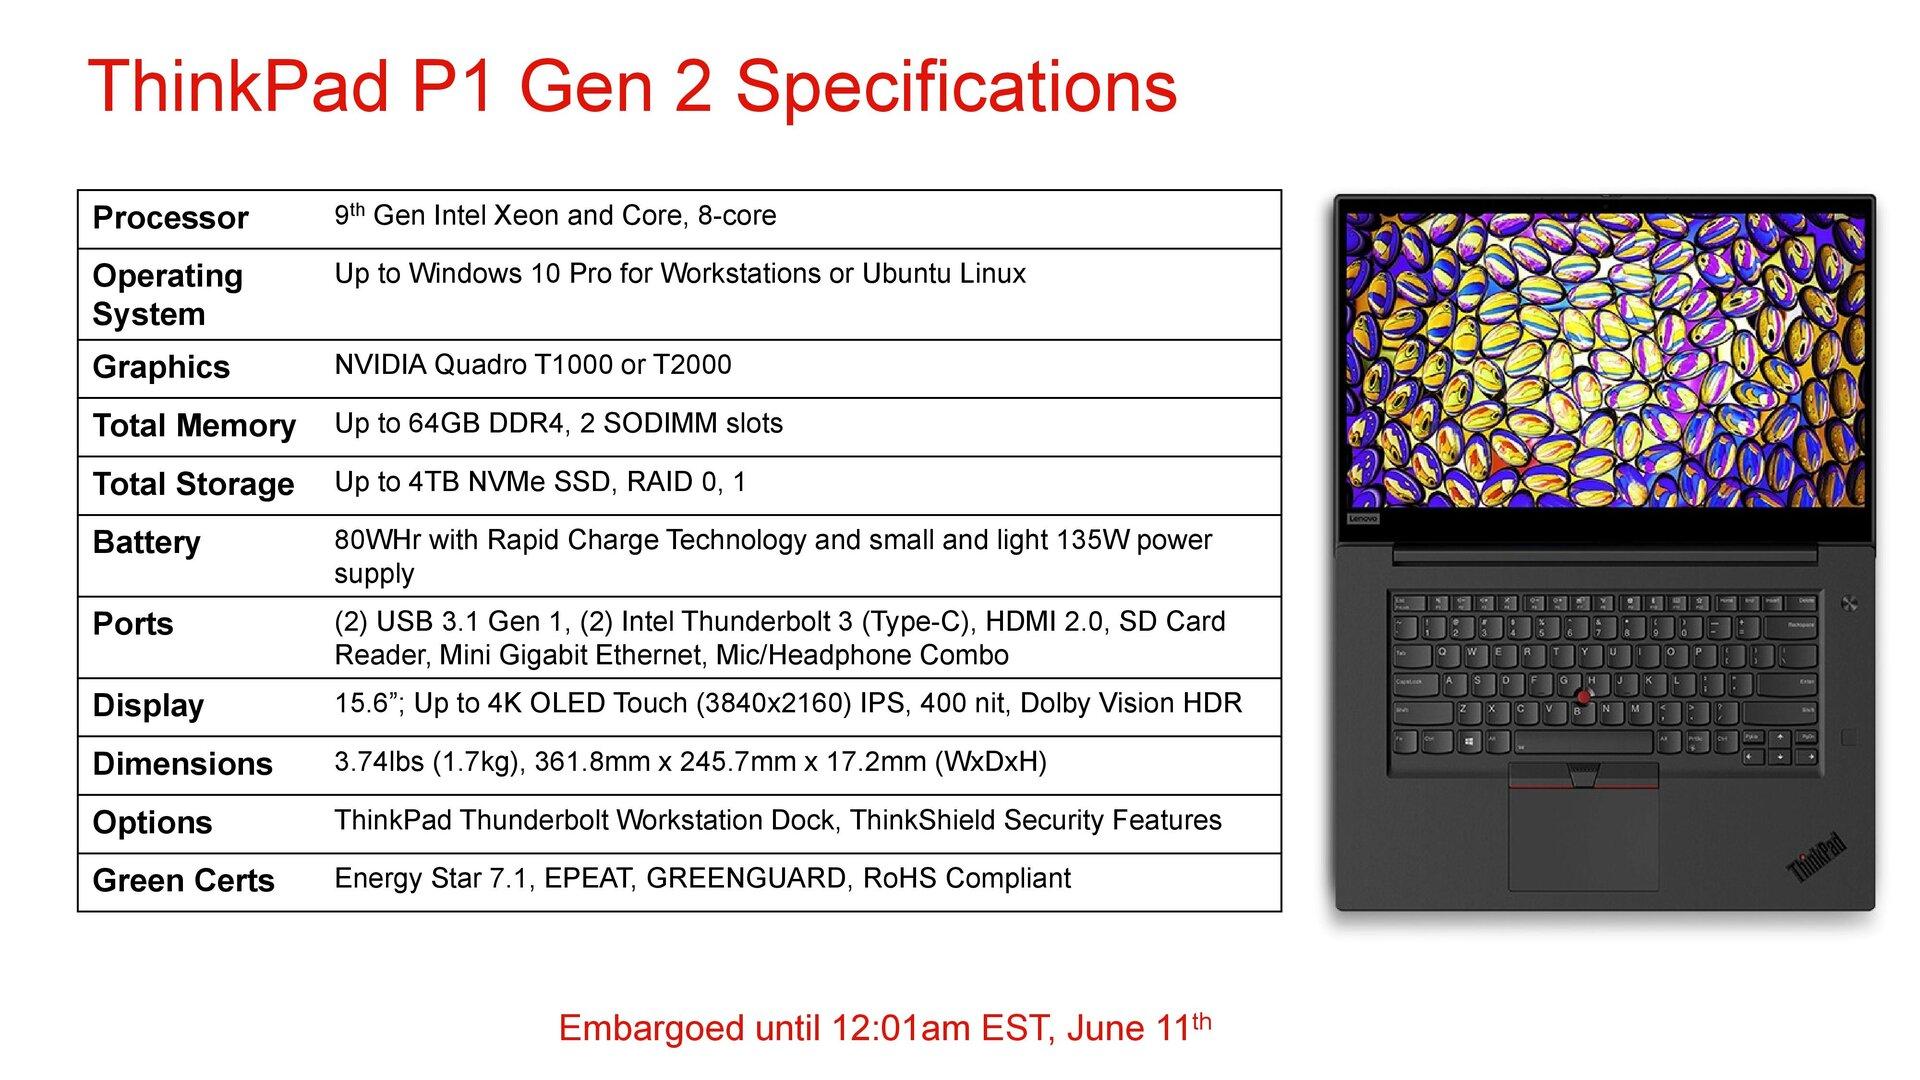 ThinkPad P1 G2